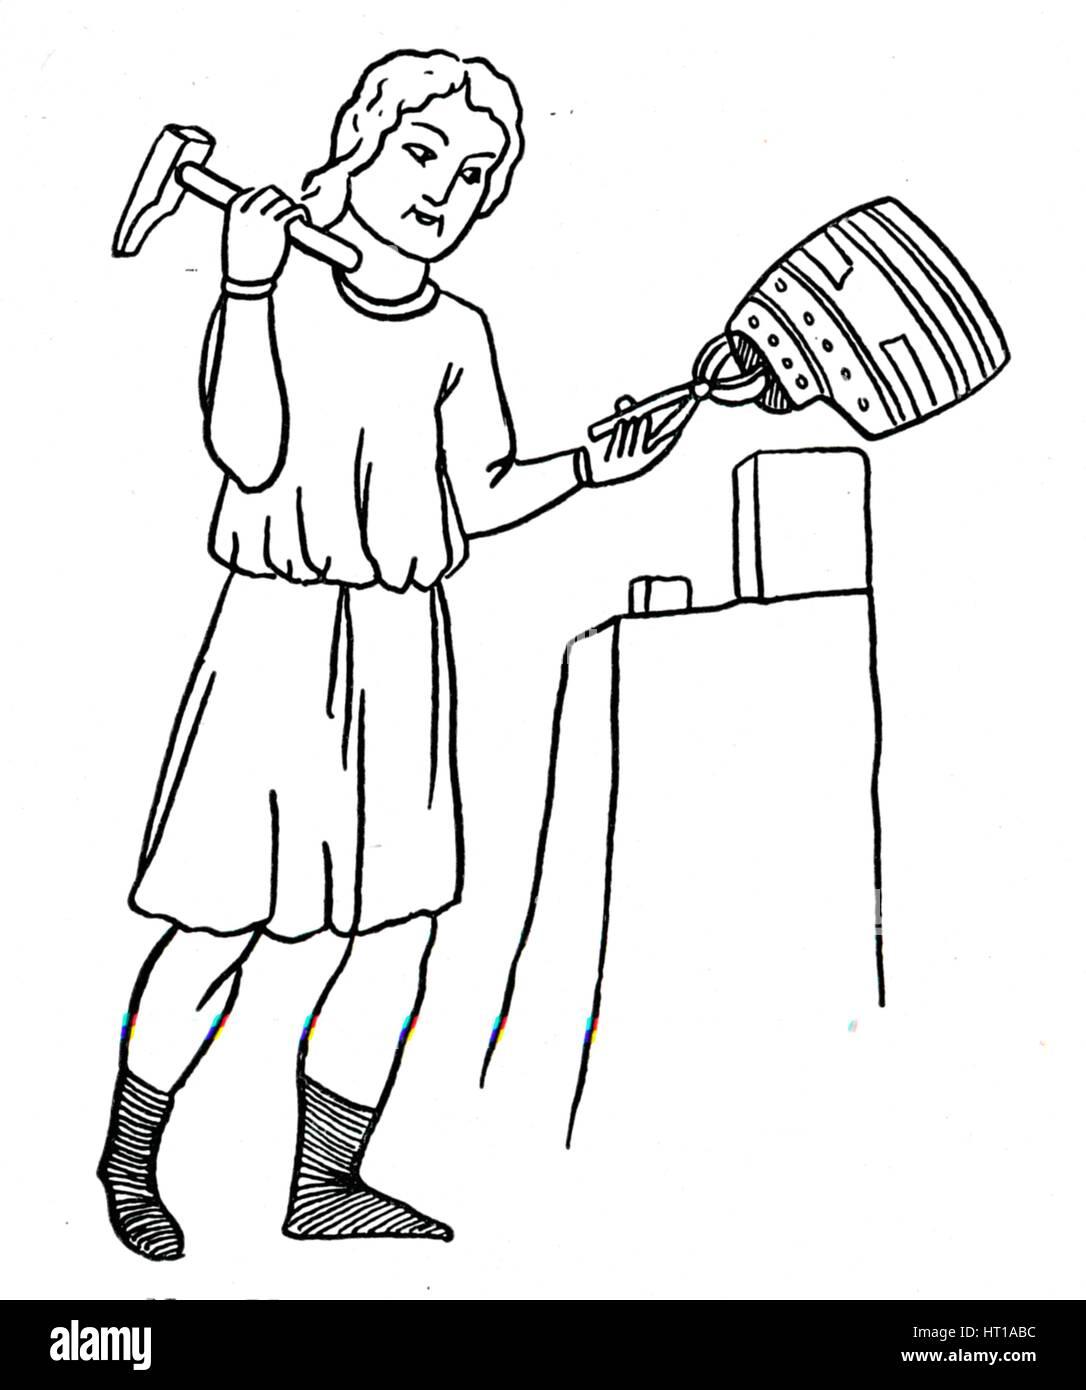 'German Helmsmith at Work', c1515. Artist: Hans Burgkmair, the Elder. - Stock Image